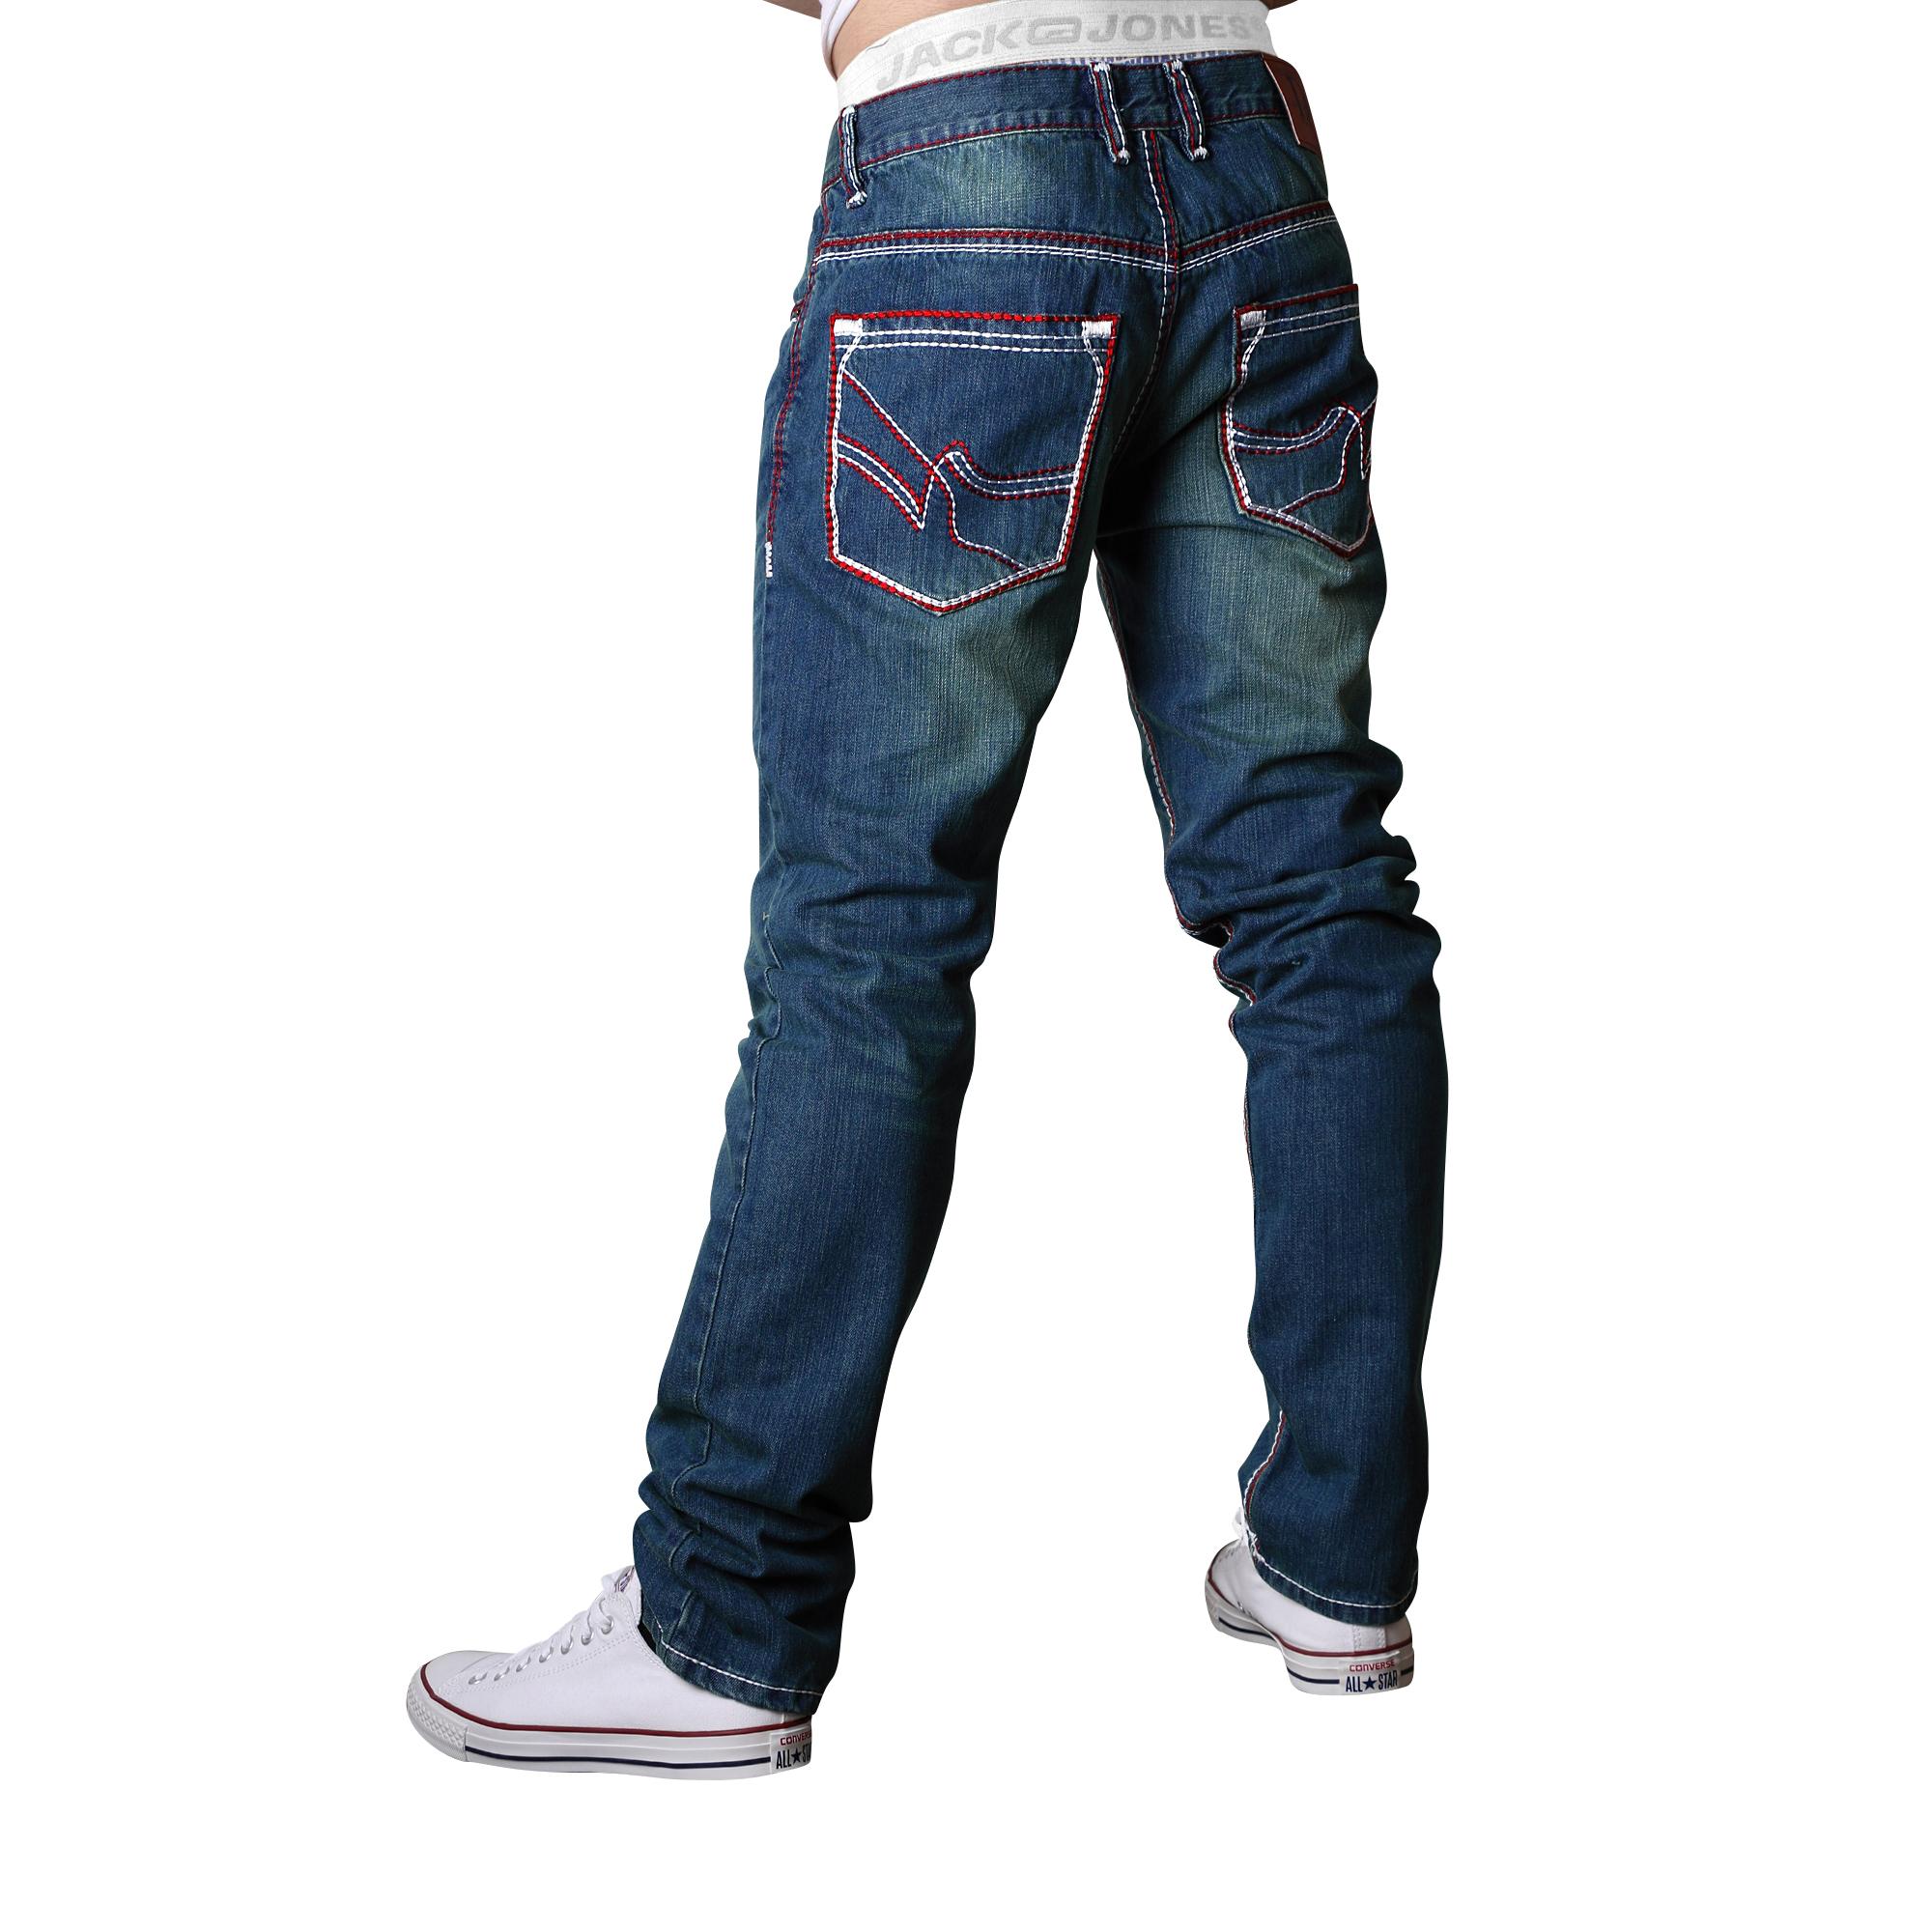 herren jeans straight cut hose dicke zier naht vintage. Black Bedroom Furniture Sets. Home Design Ideas